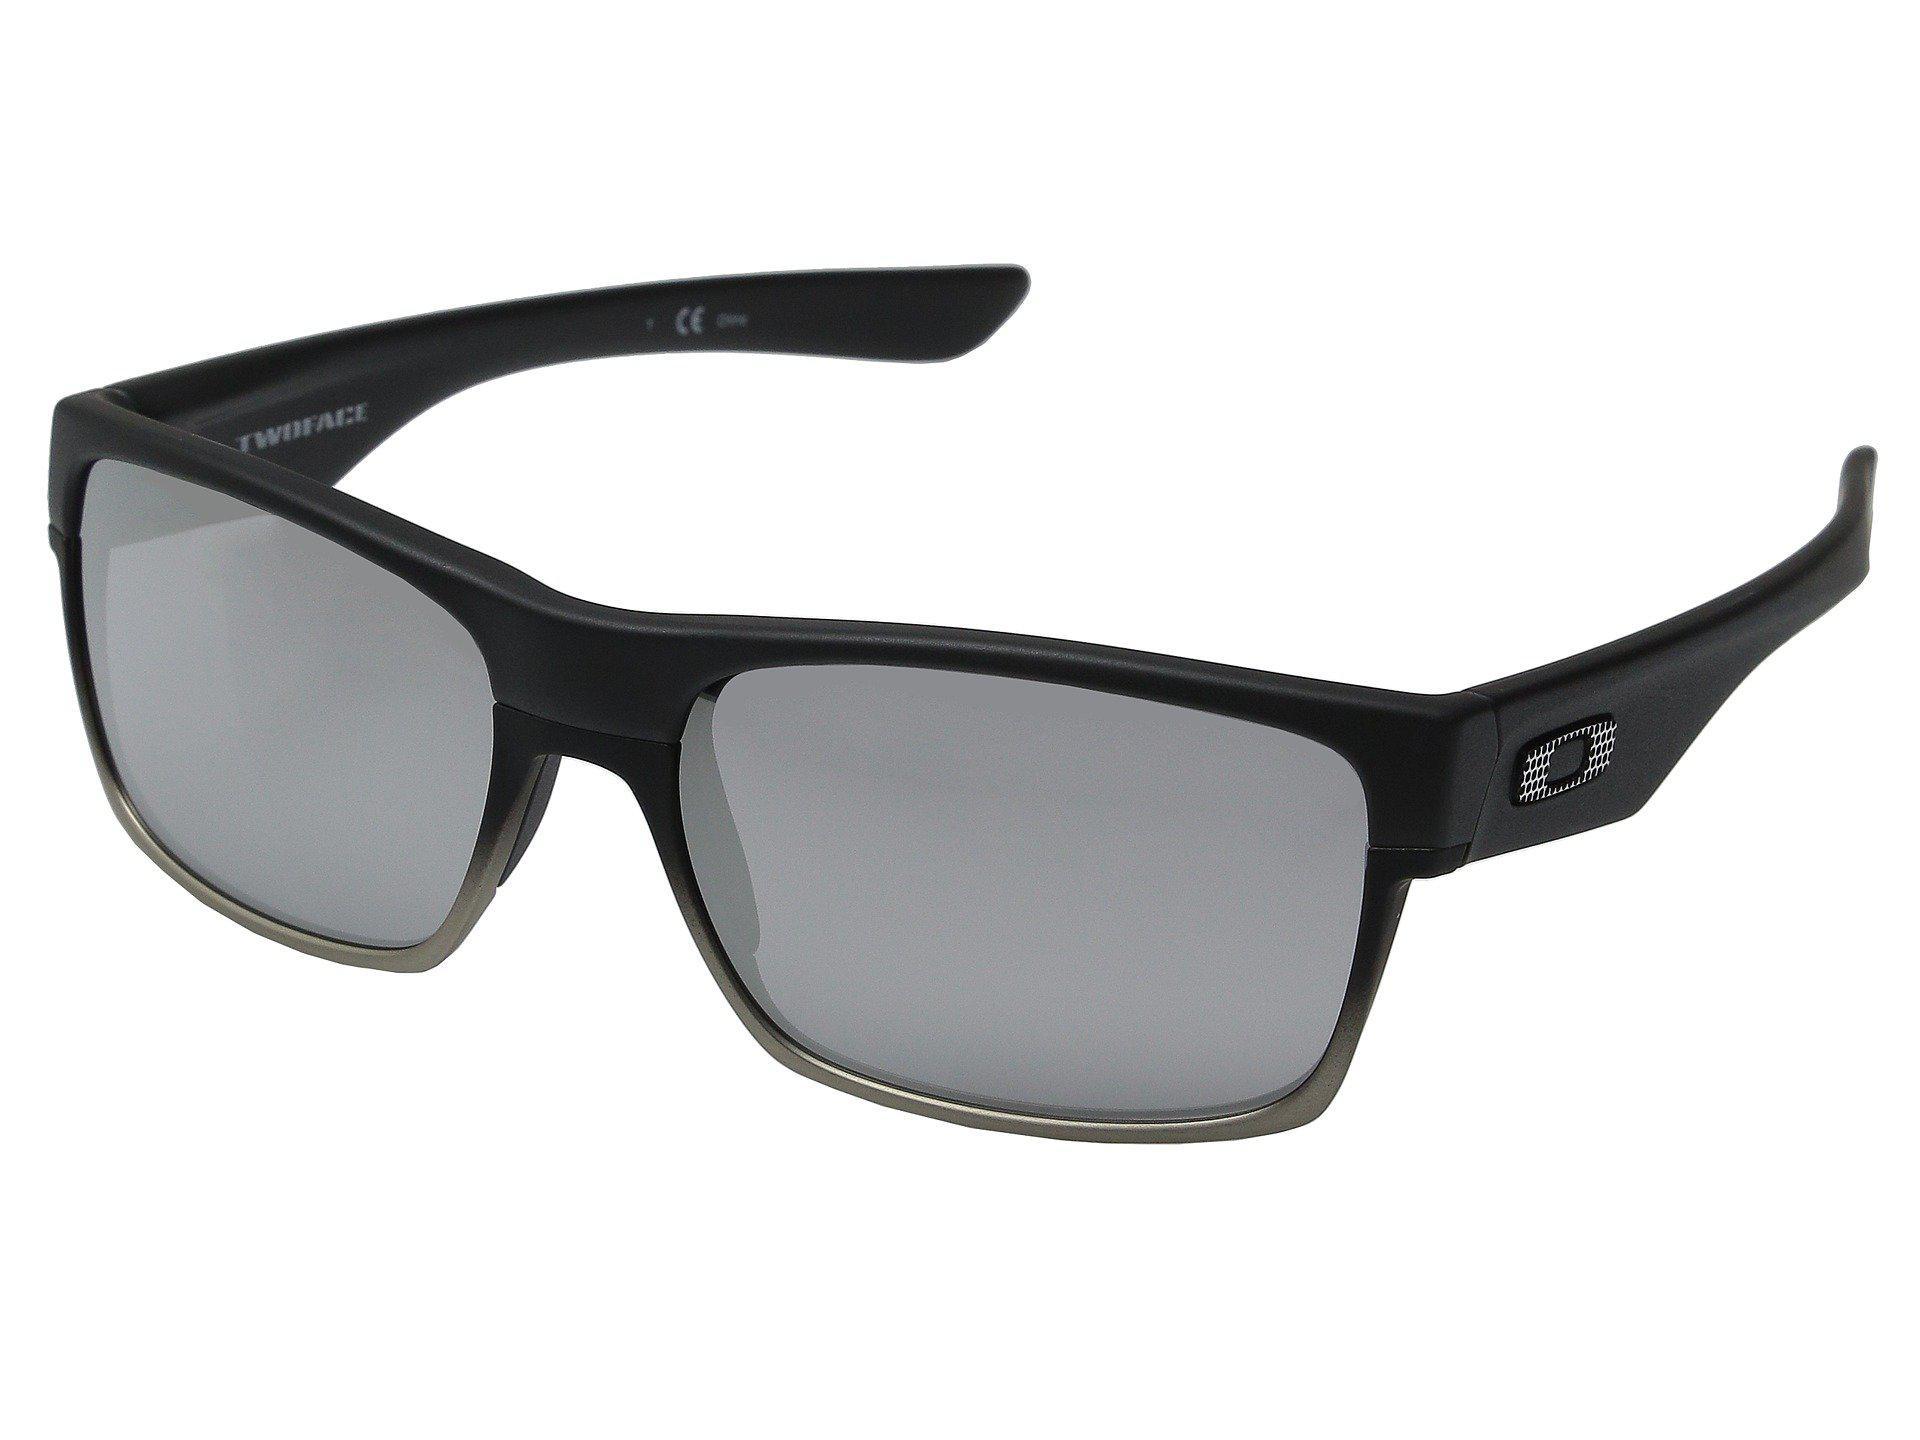 0d4e4fb2fa Lyst - Oakley Two Face (steel grey) Sport Sunglasses in Black for Men